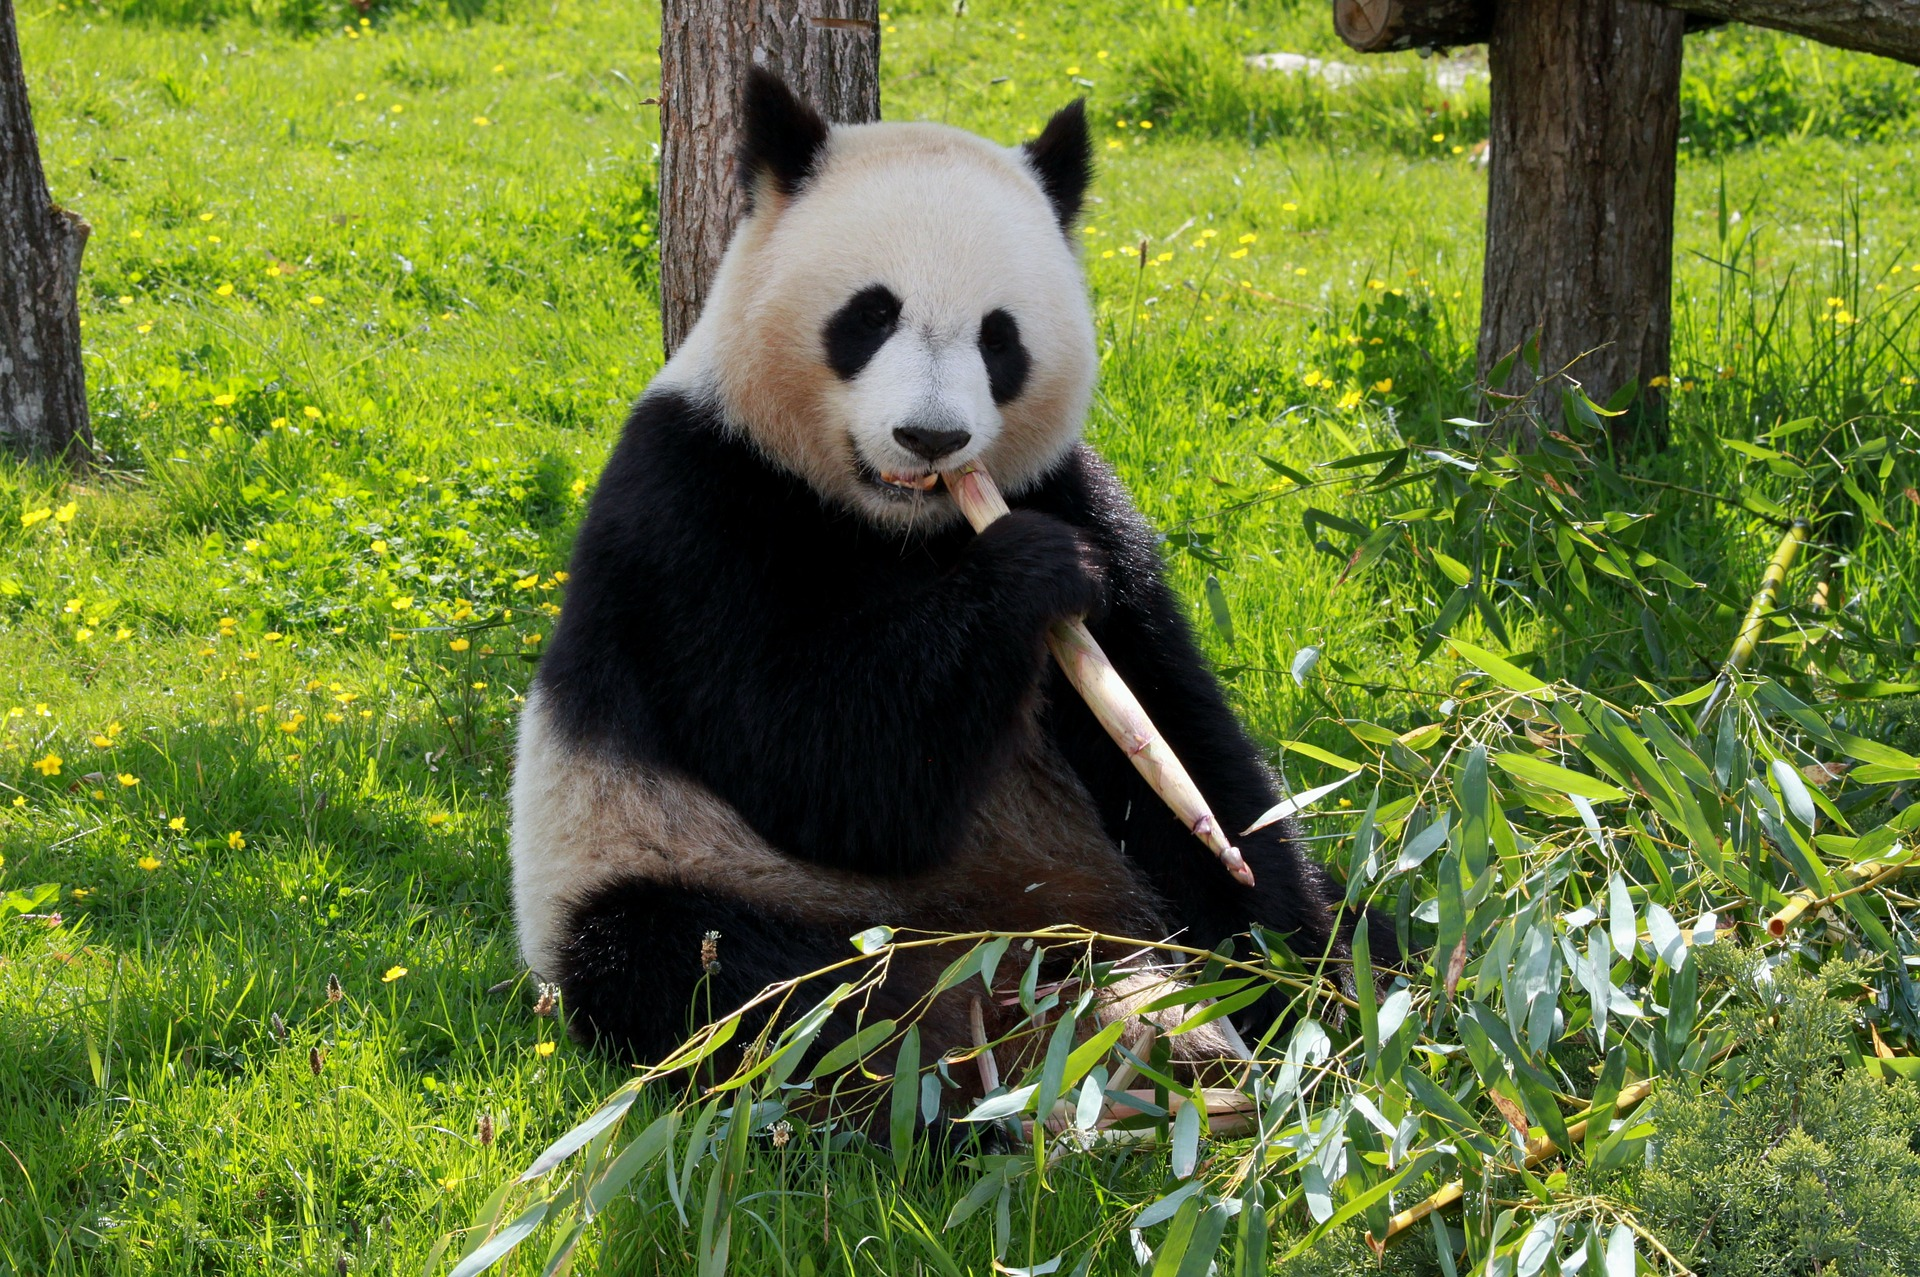 Panda_in_Chengdu